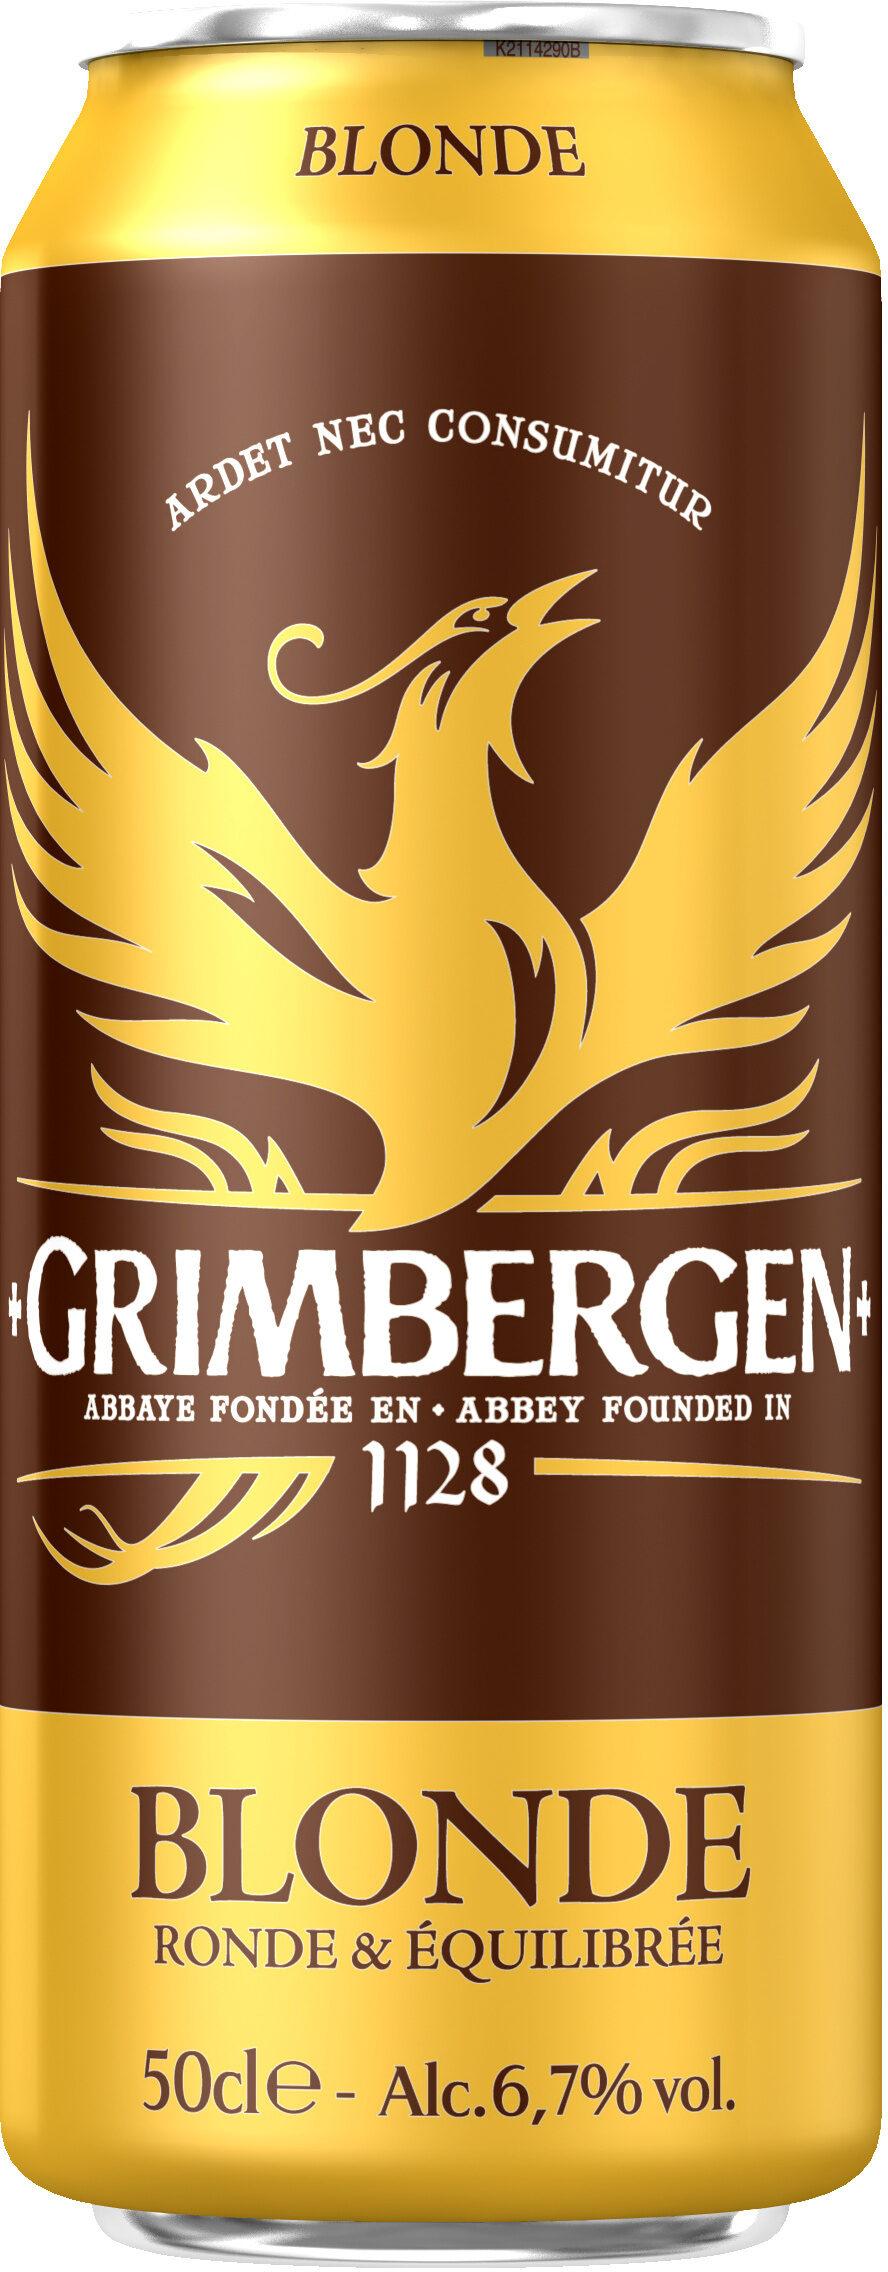 Grimbergen - 50cl bte grimbergen - 6.70 degre alcool - Produit - fr